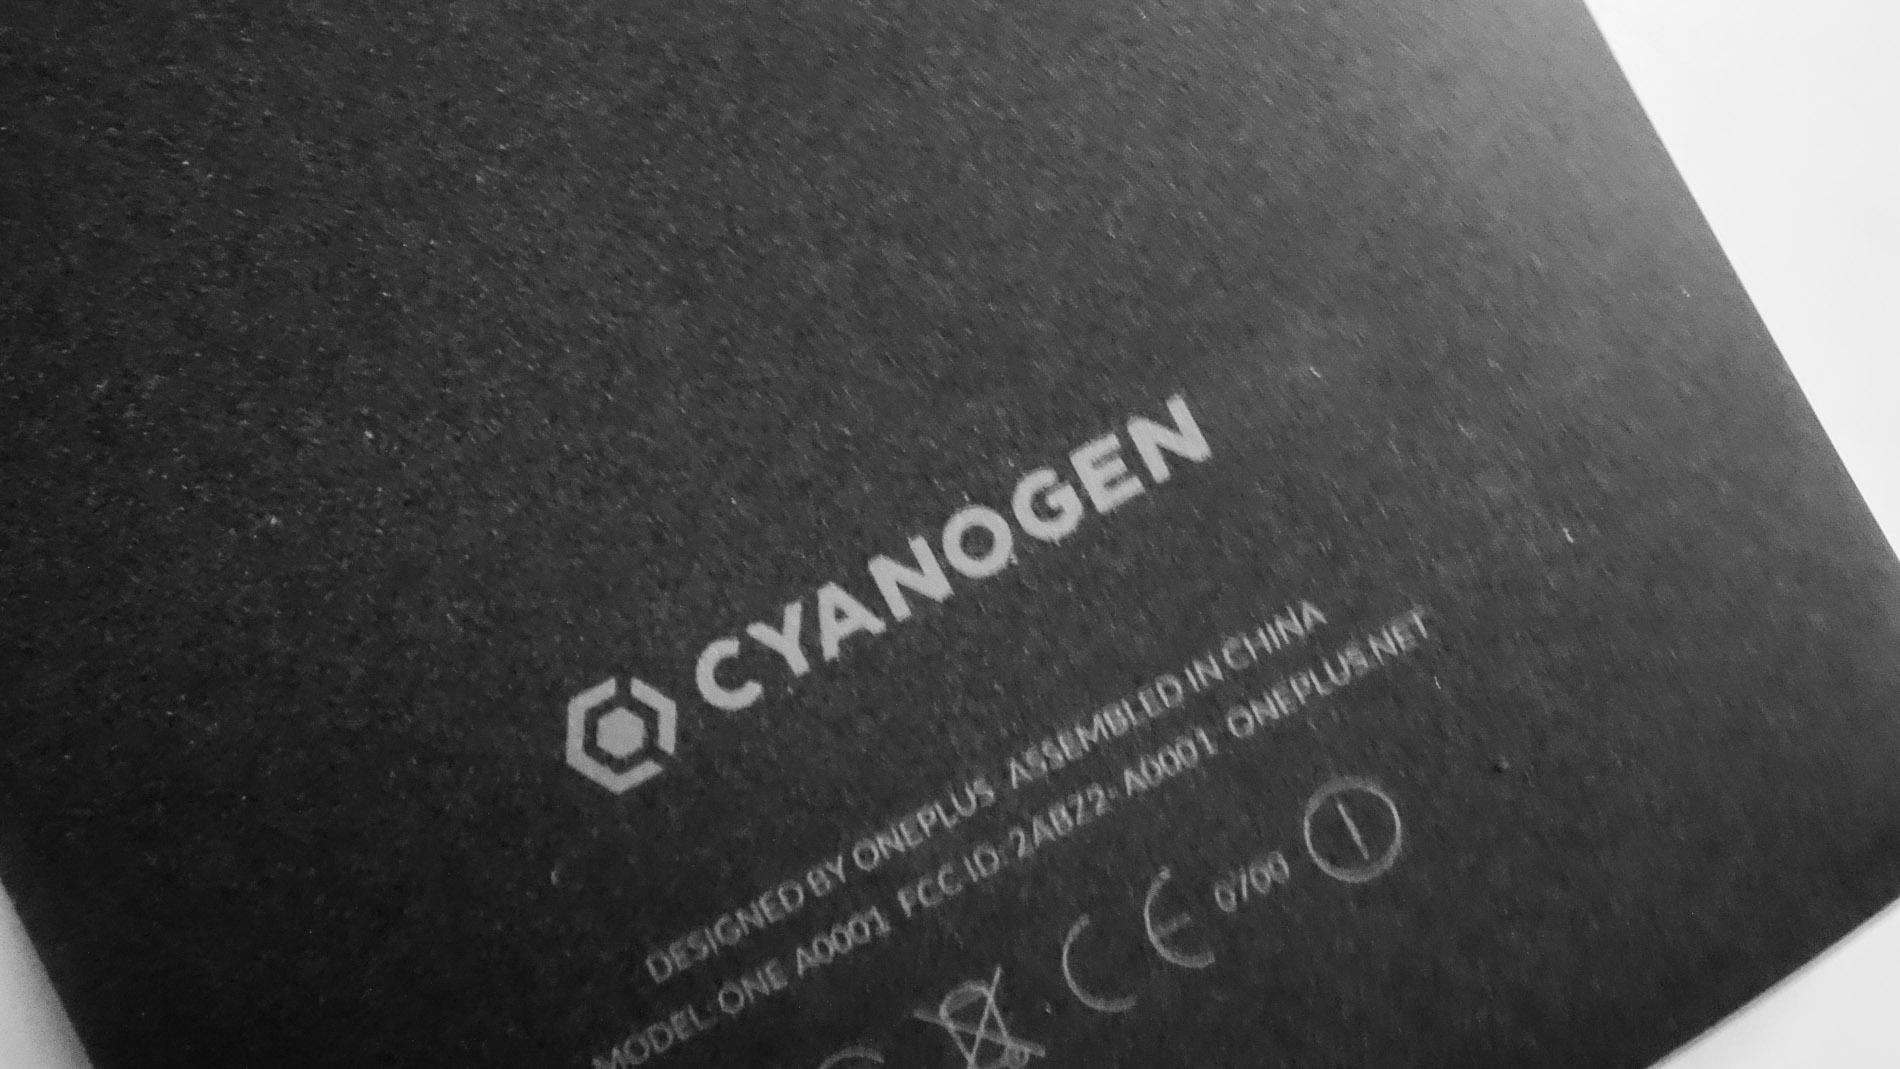 Cortana sera bientôt intégrée de façon profonde à Cyanogen OS